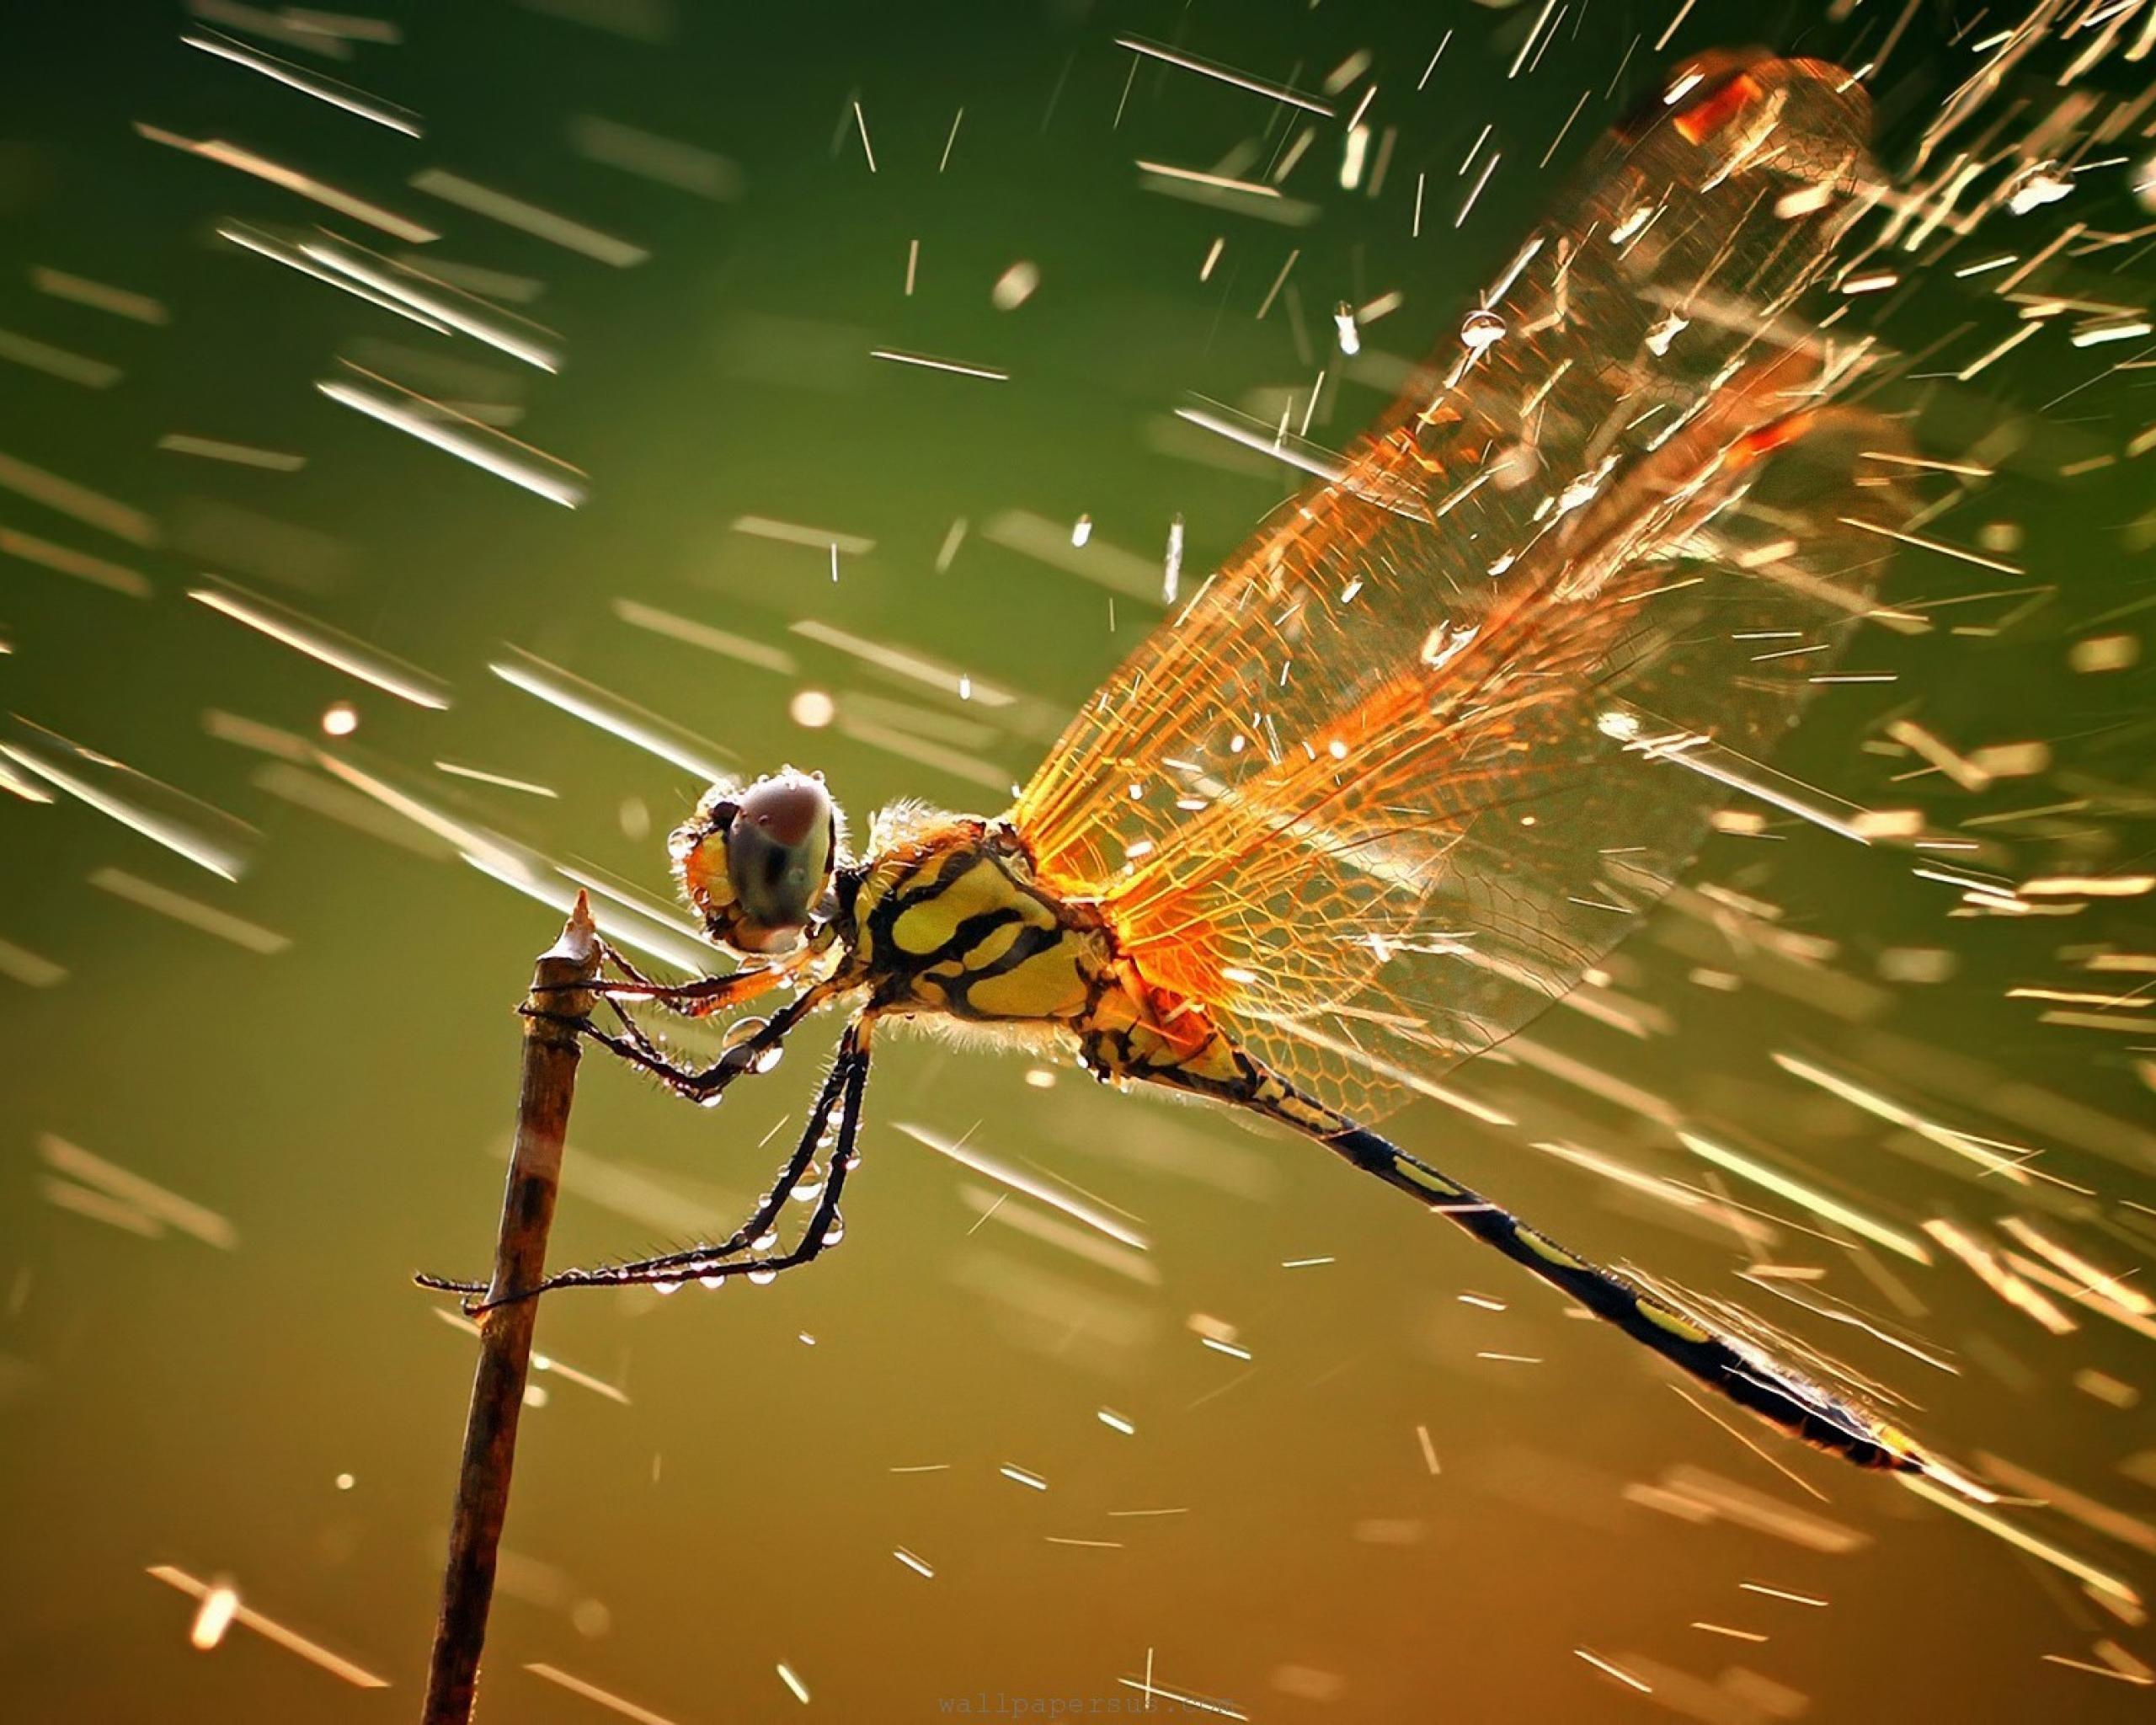 Dragonfly Desktop Wallpapers FREE on Latorocom 2560x2048